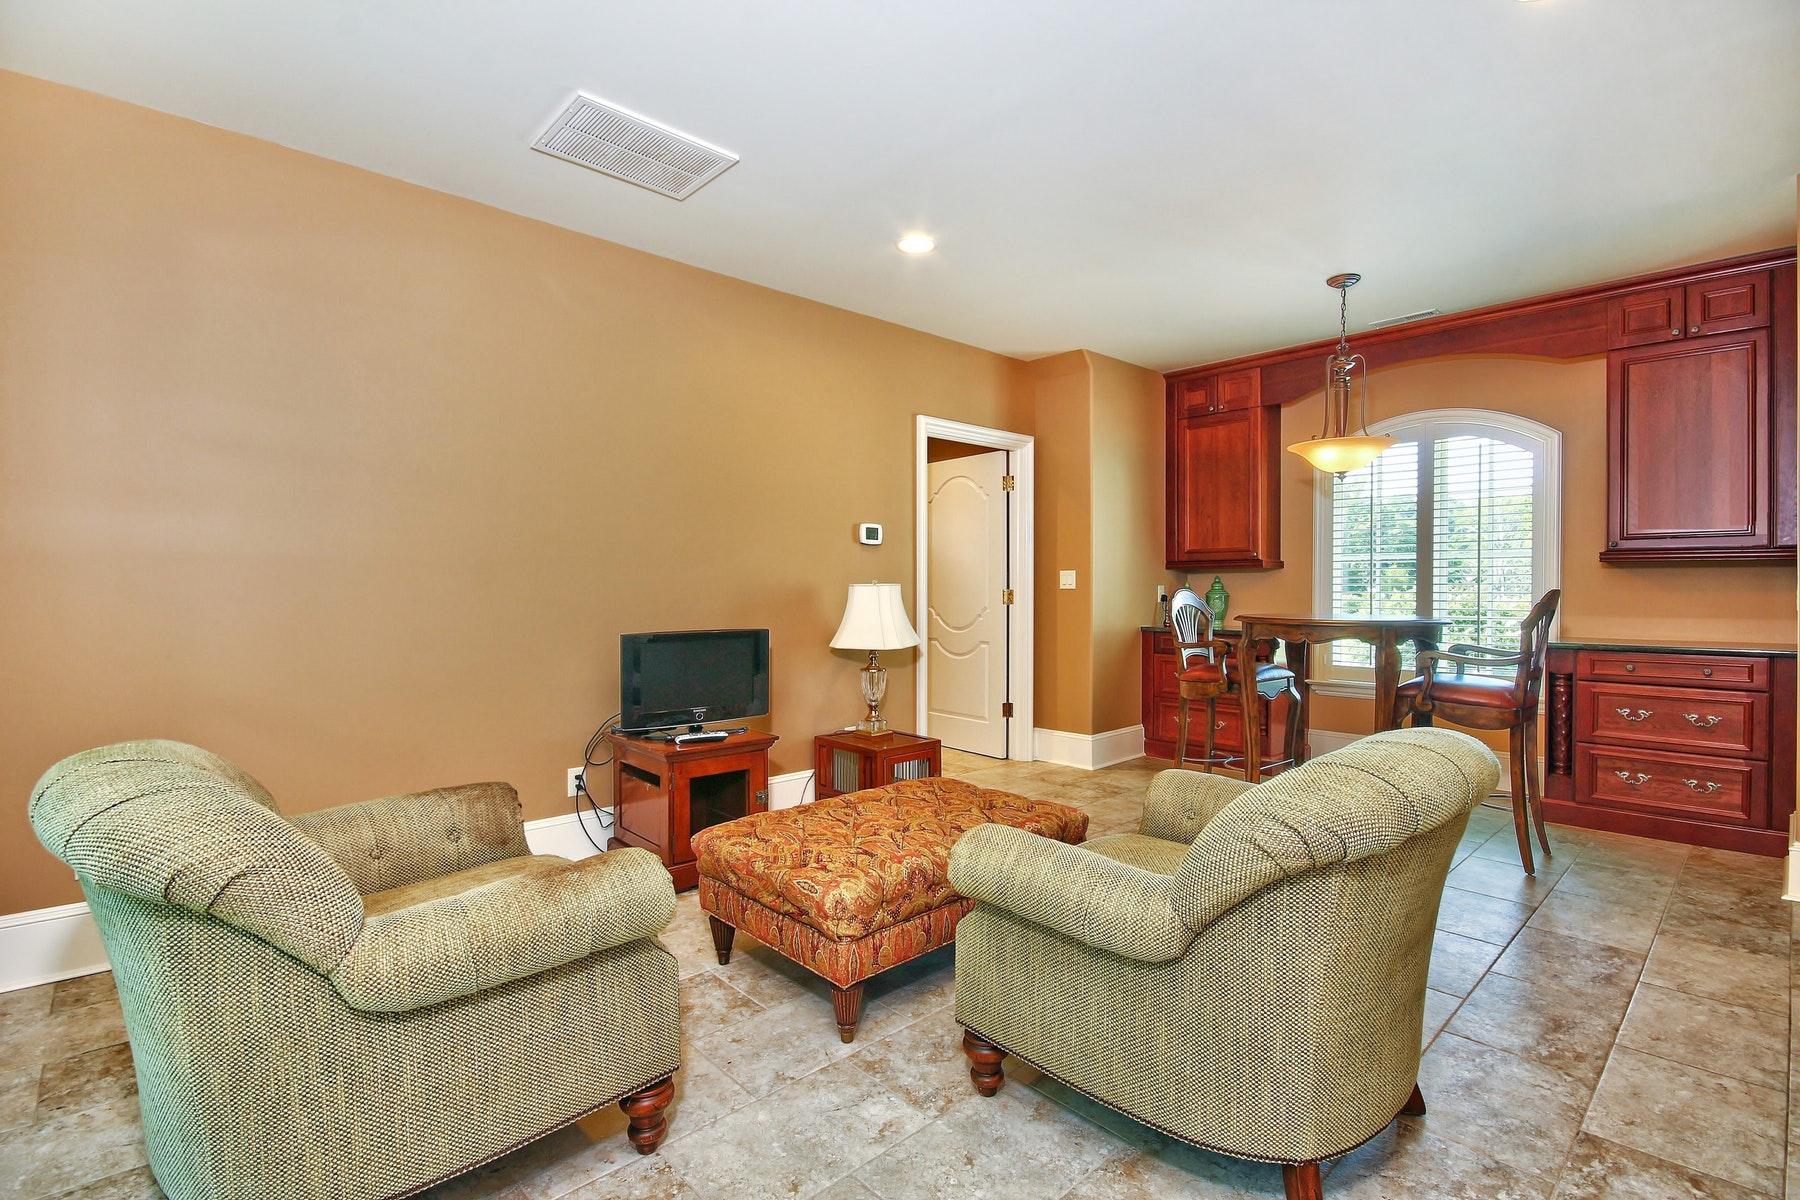 Additional photo for property listing at 149 Blue Violet Way 149 Blue Violet Way Durham, North Carolina 27713 United States